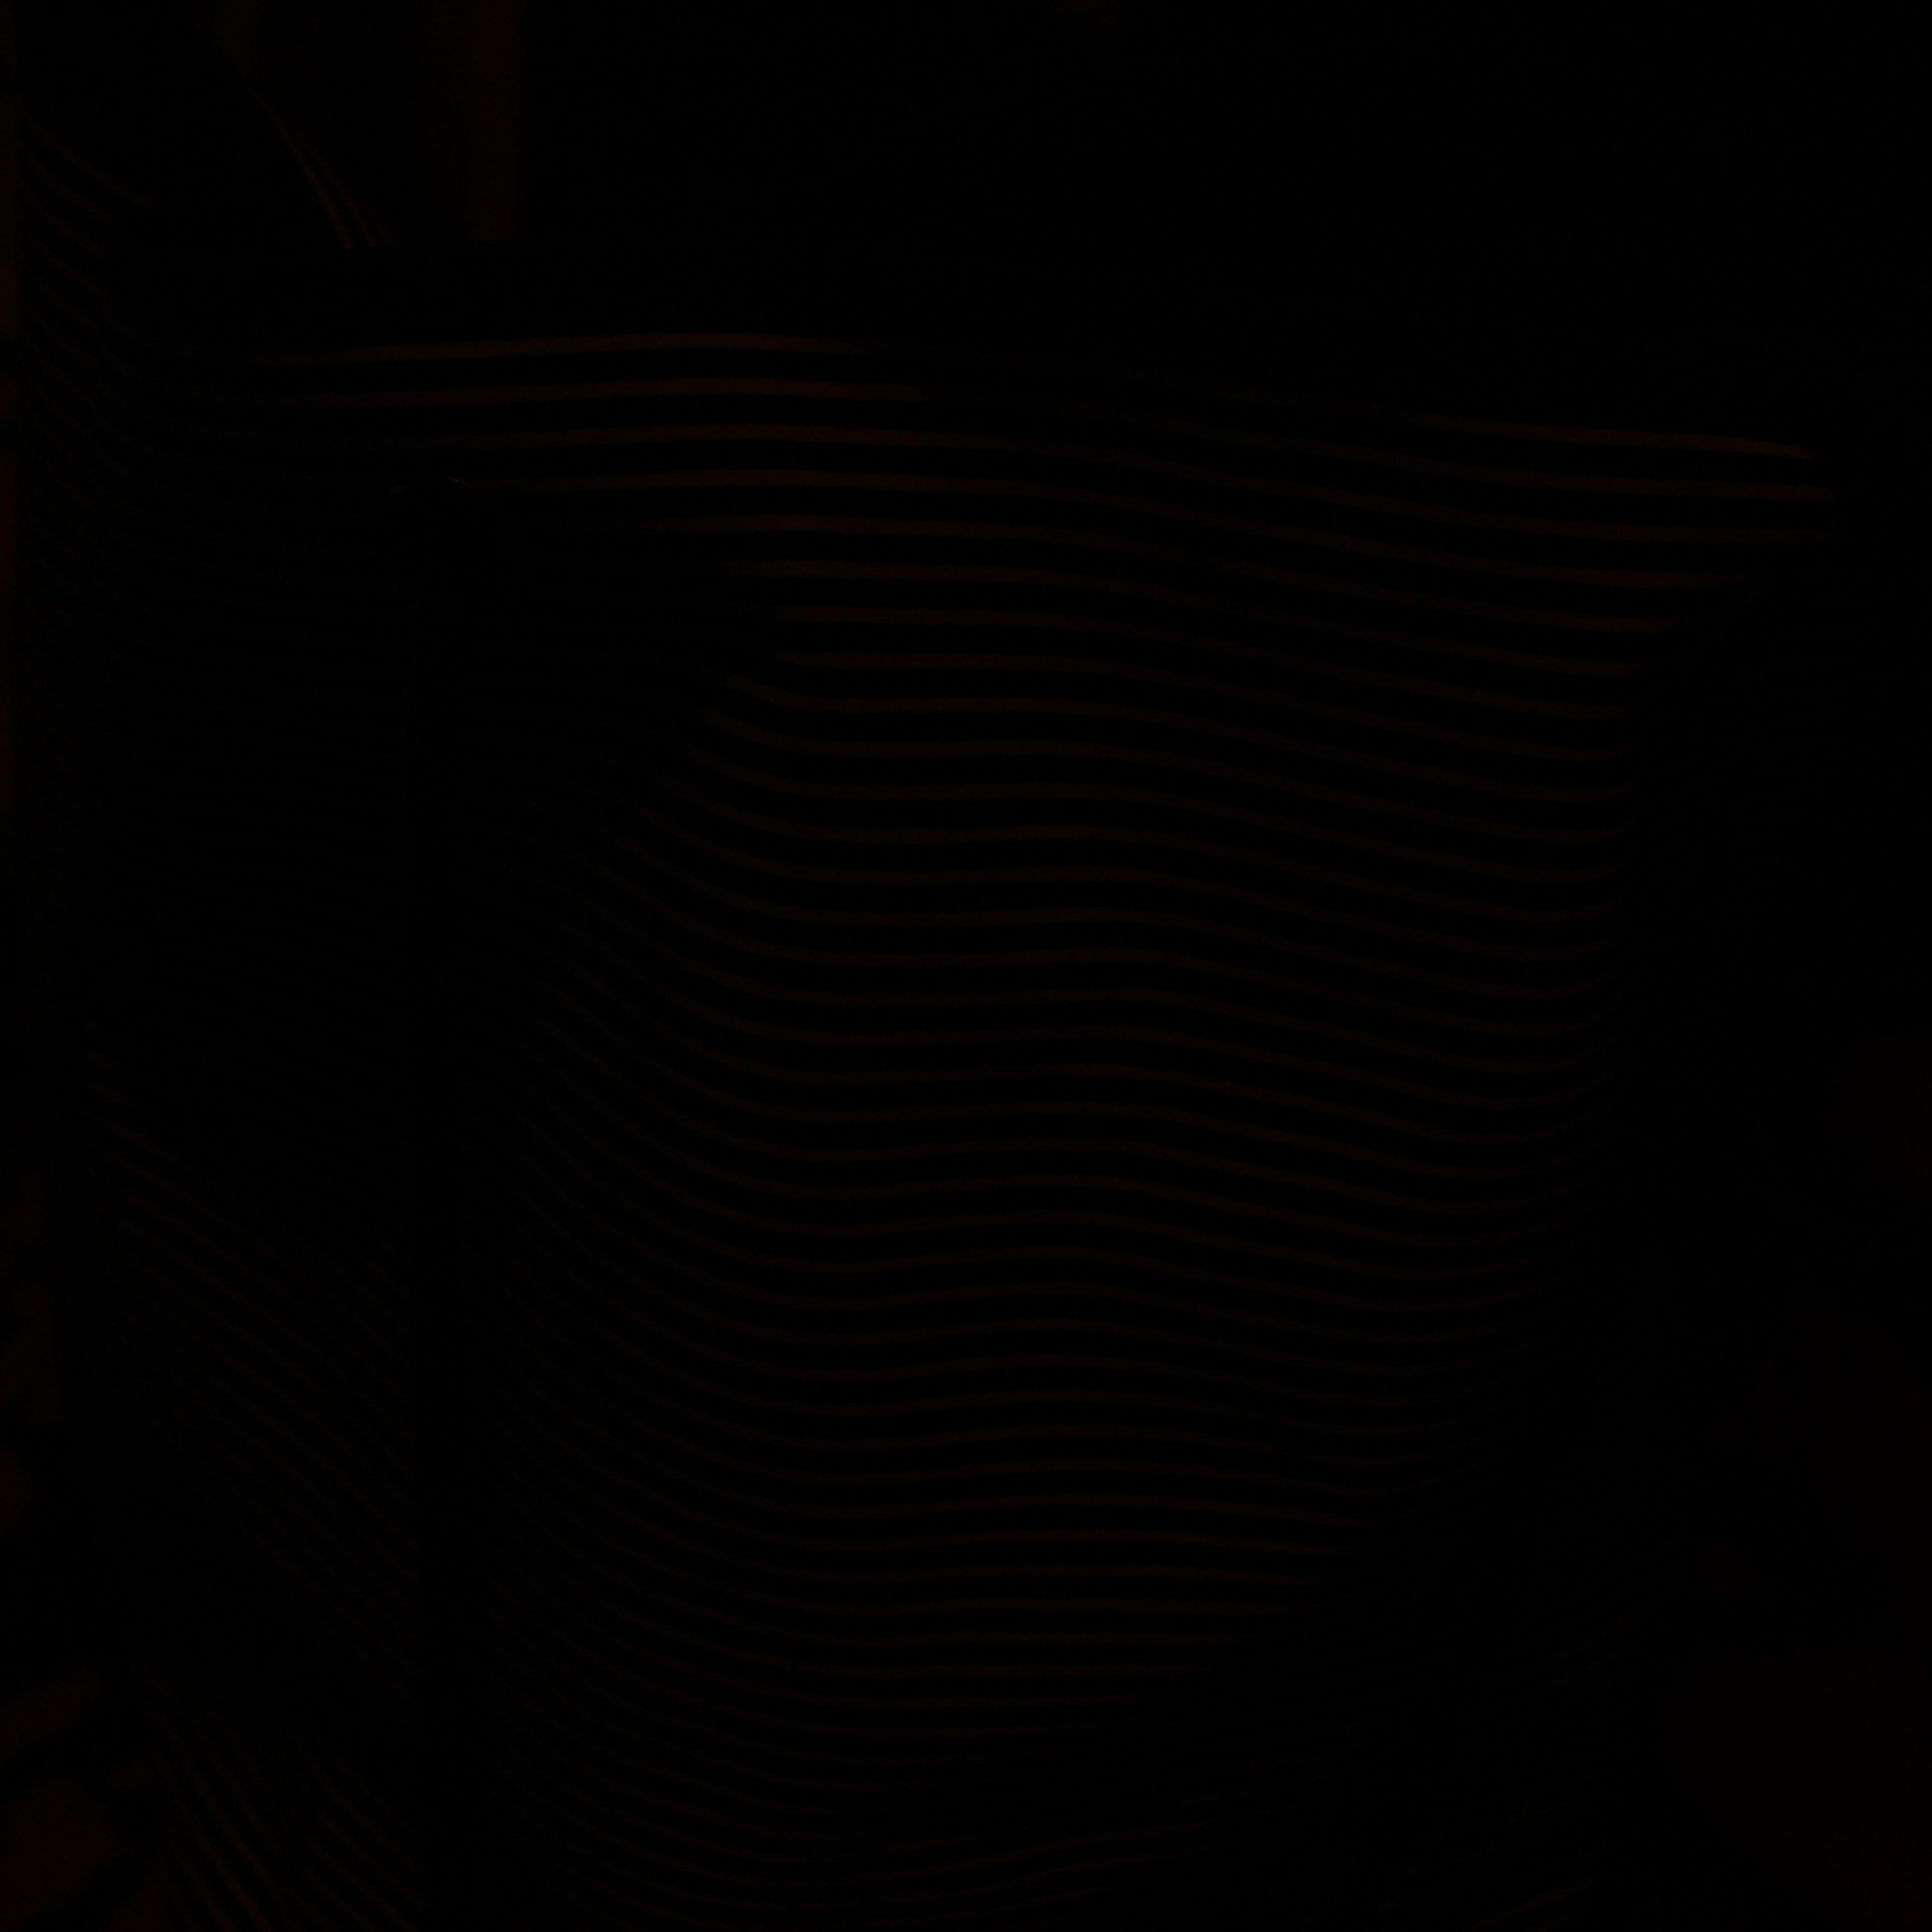 3fncww8cseiirsvi613g_black-background-image-29